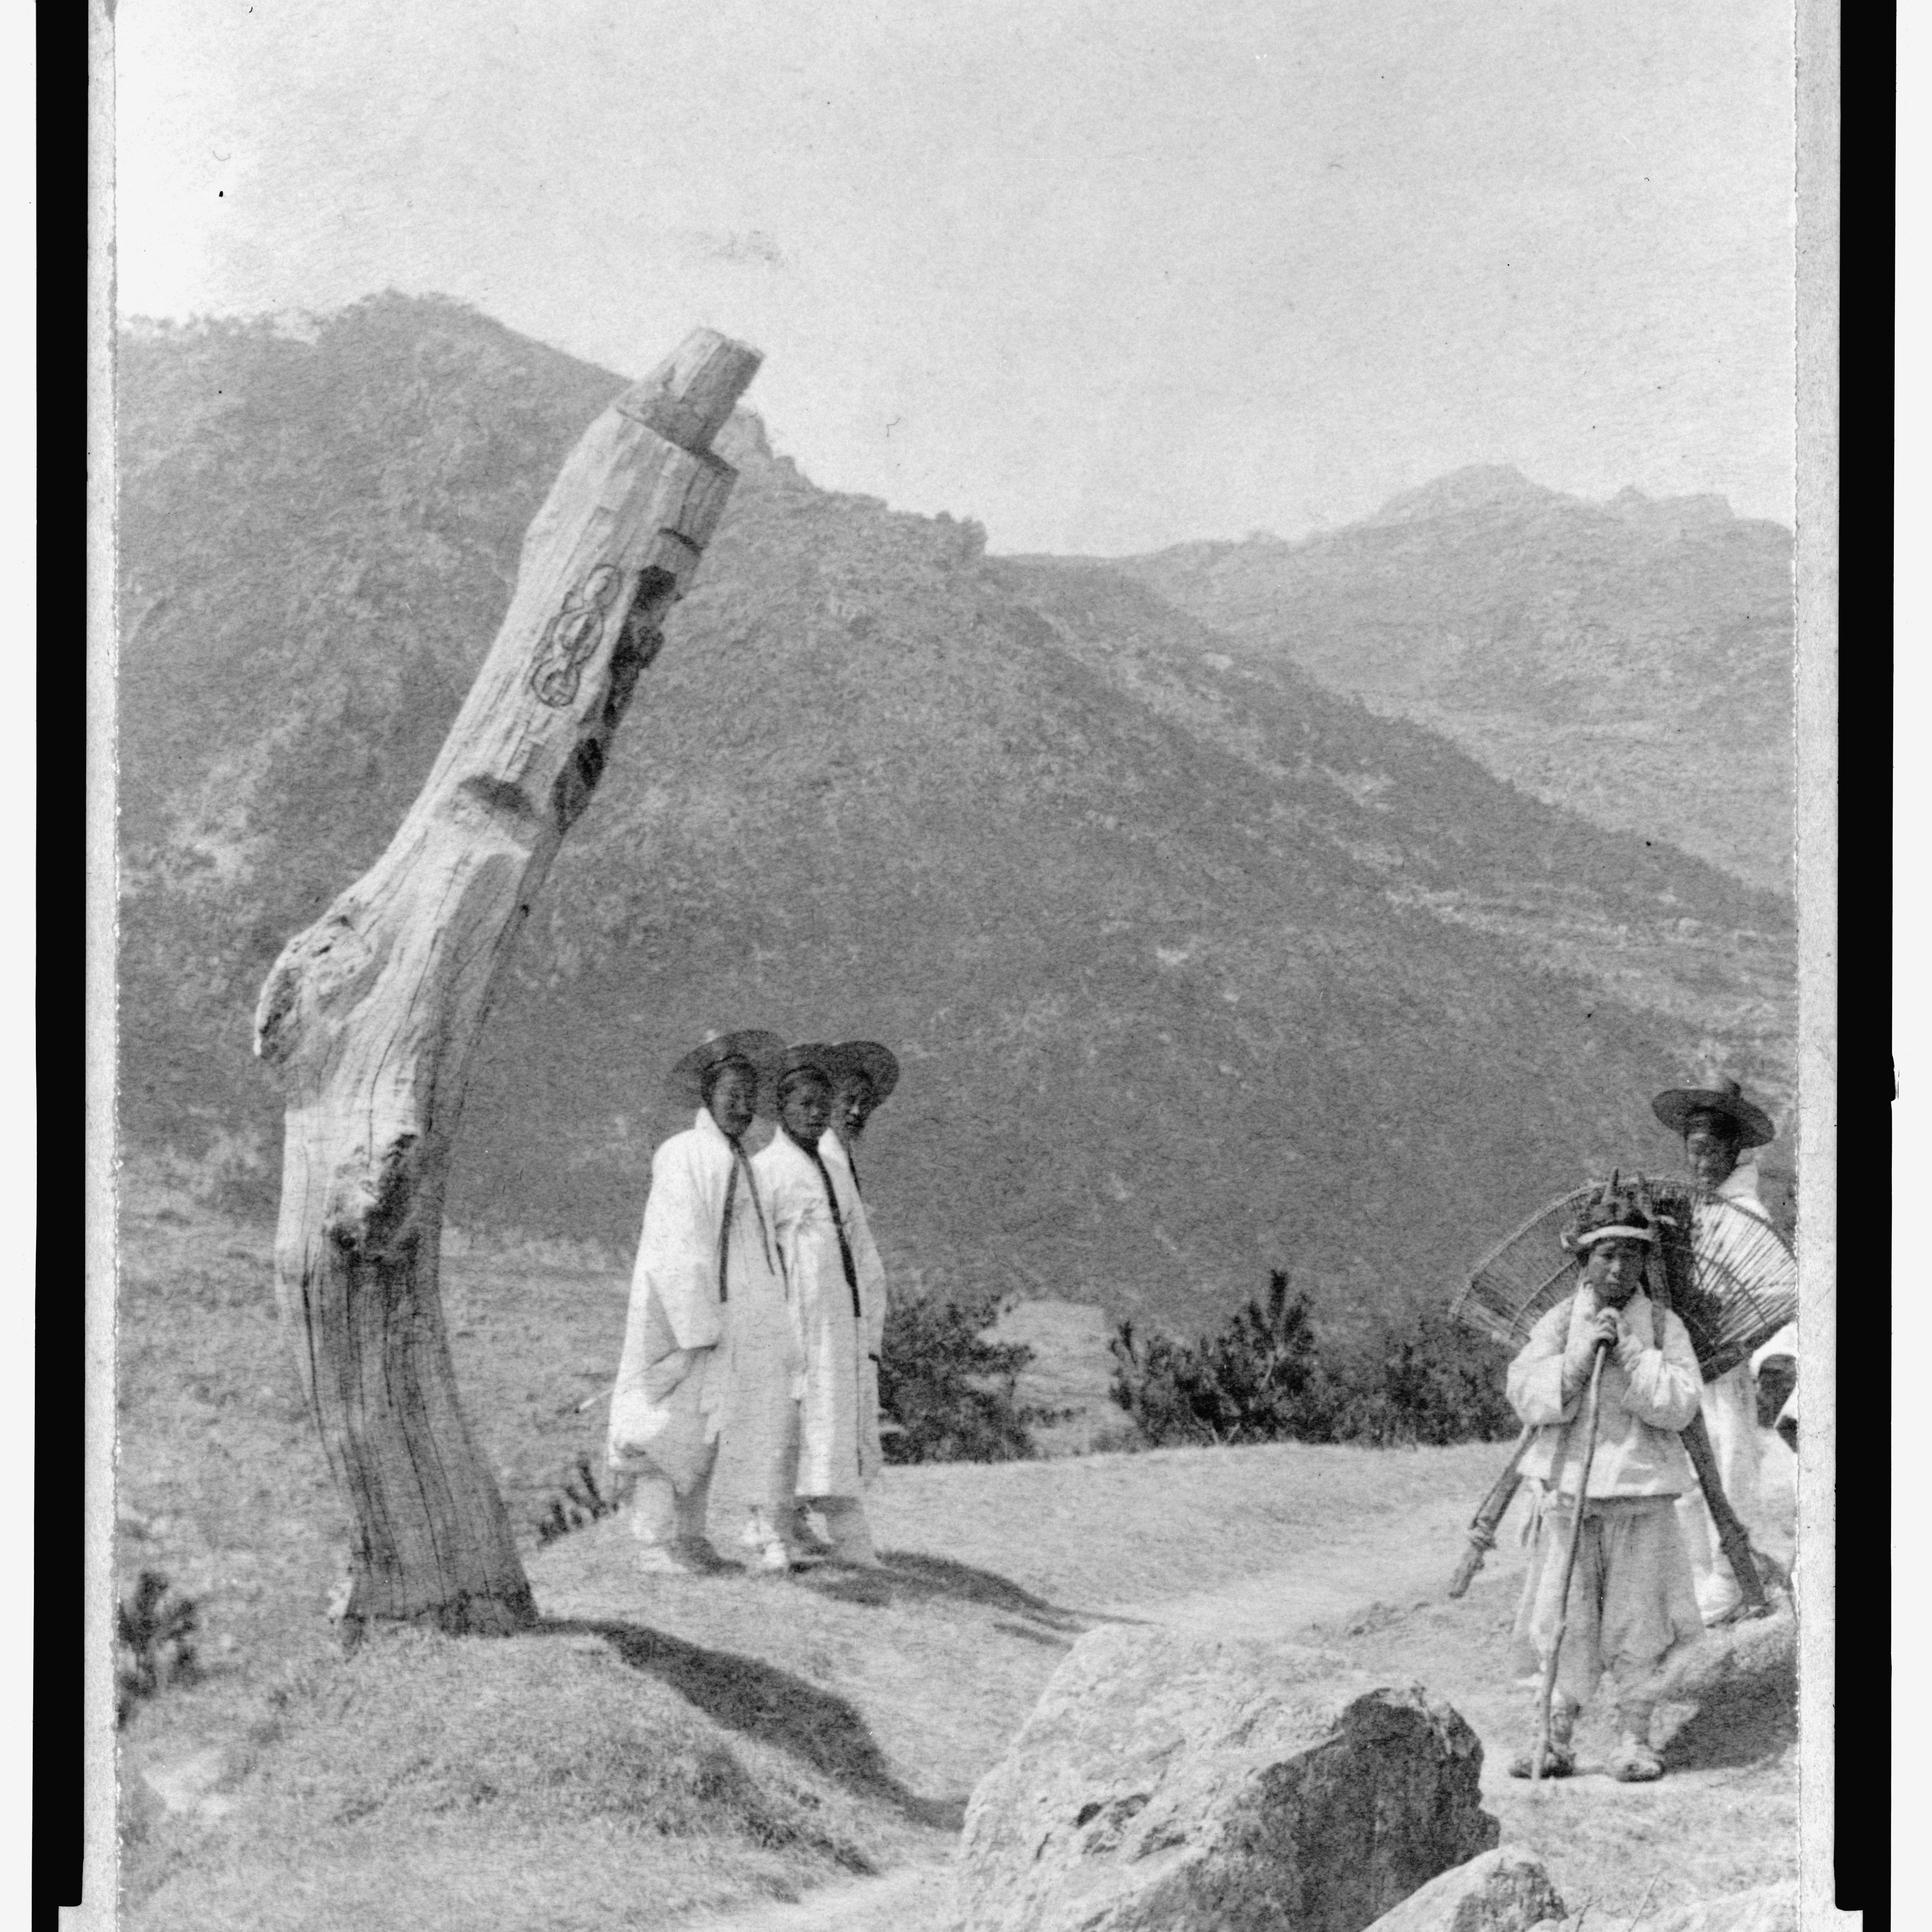 Photo by Frank Carpenter, c. 1920-27